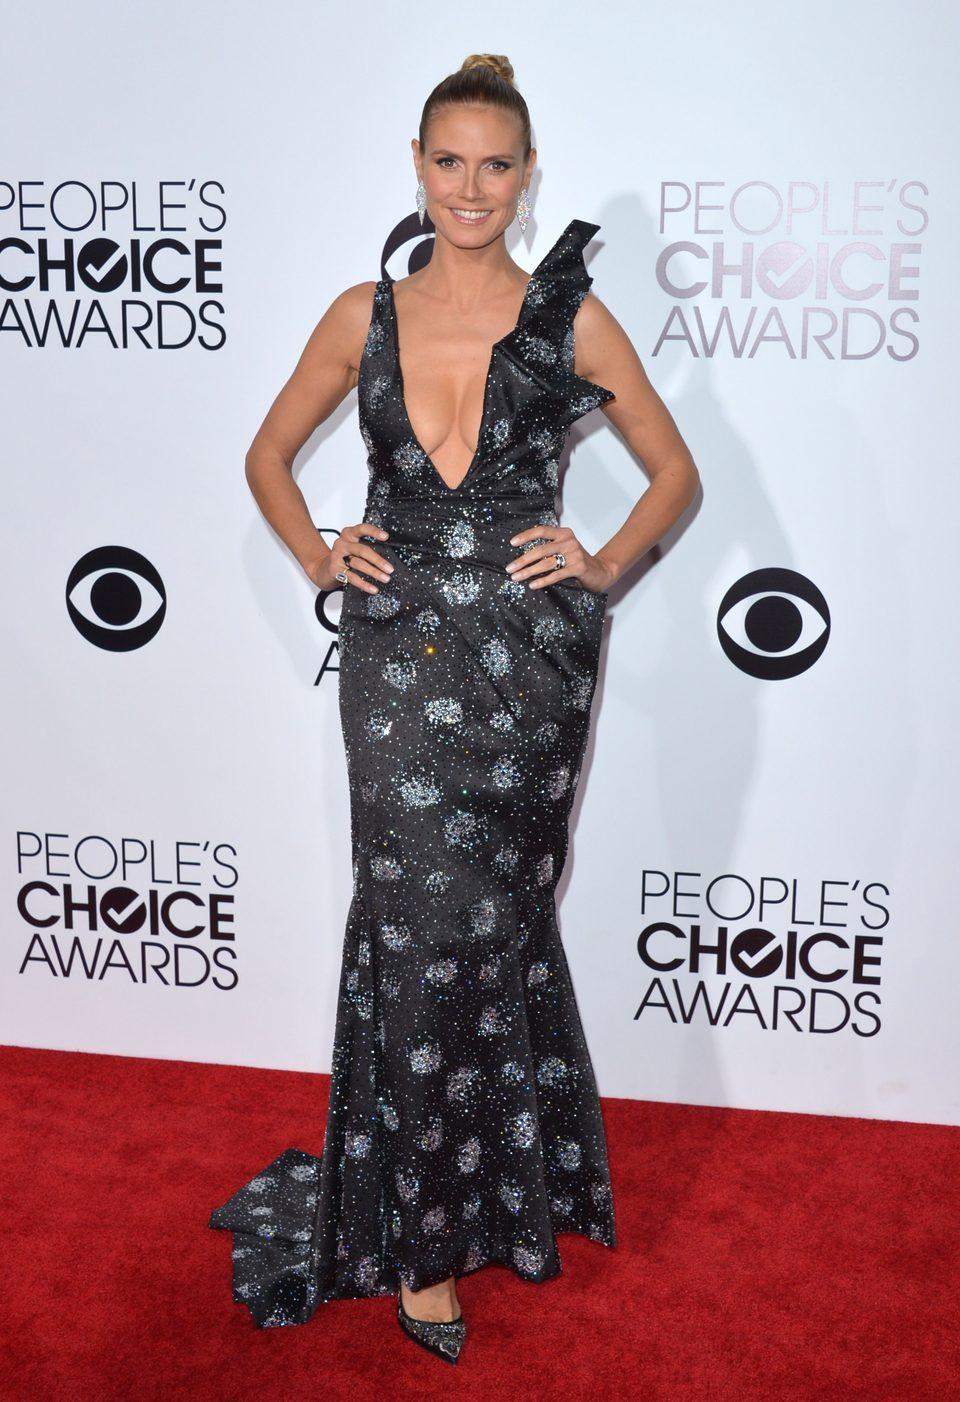 Heidi Klum en los People's Choice Awards 2014